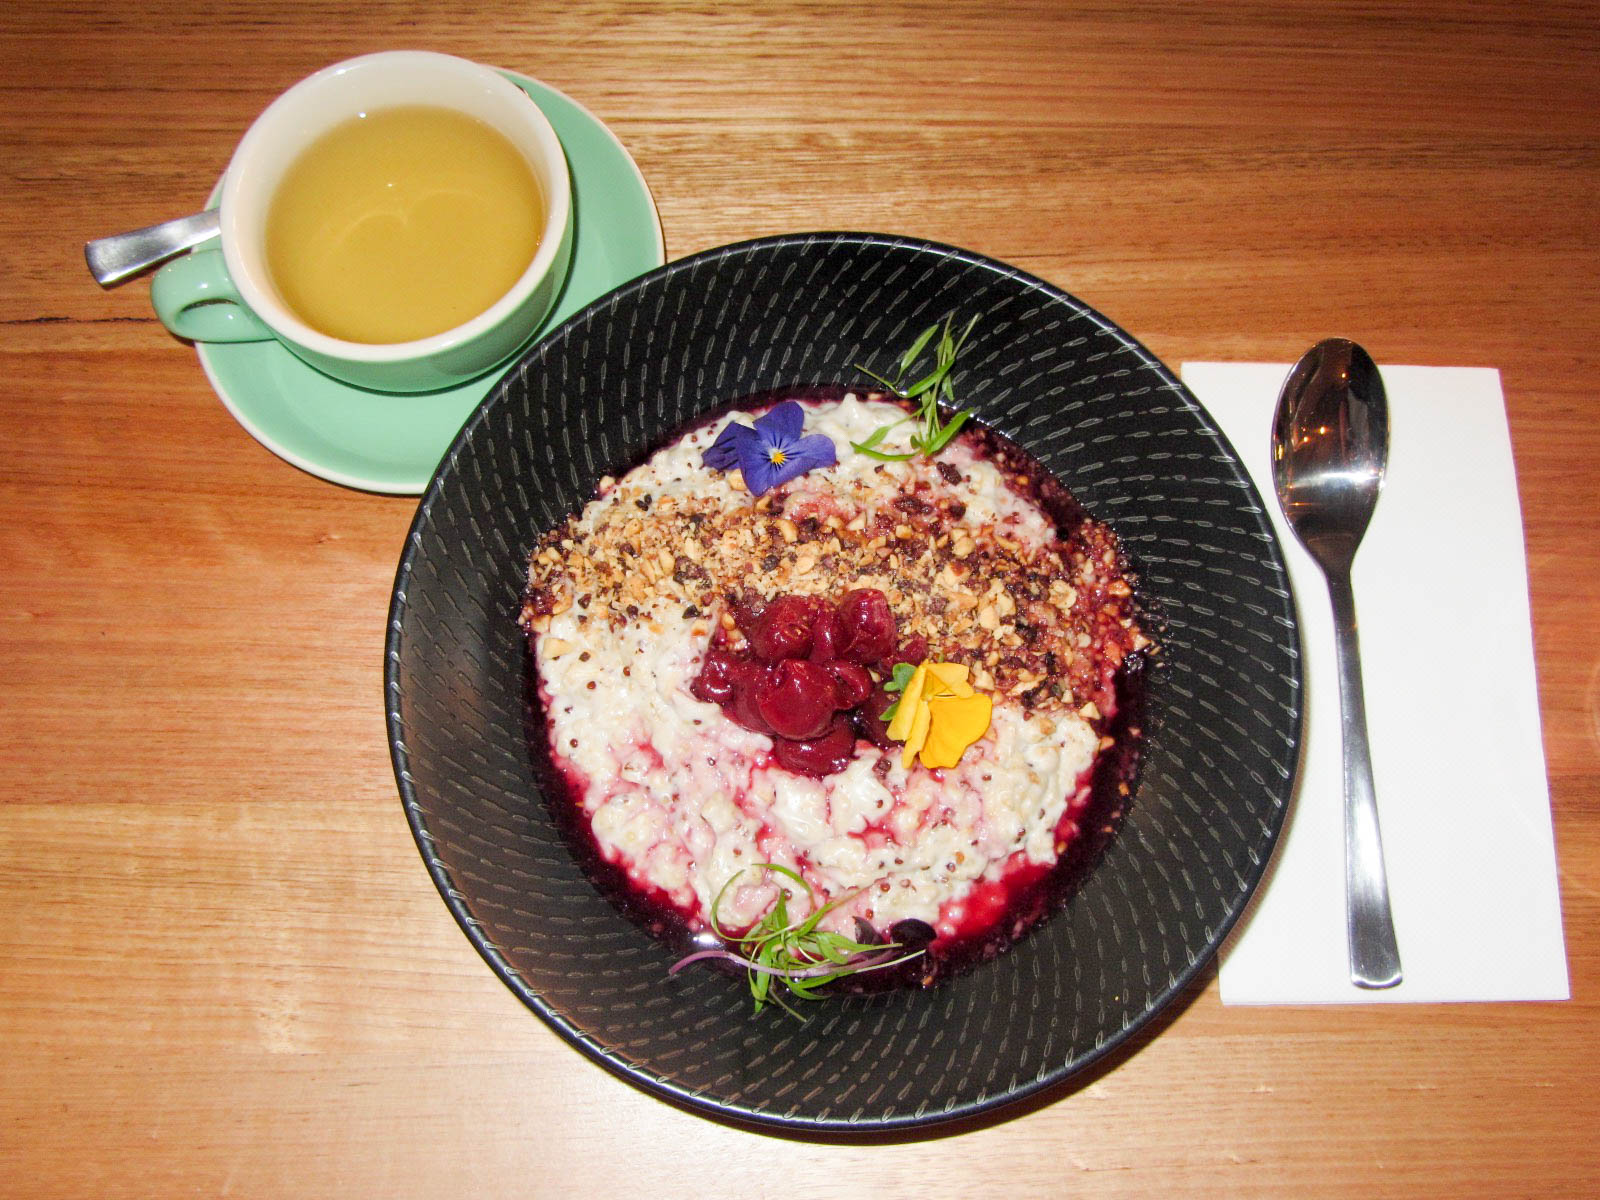 My super food coconut porridge and peppermint tea by Larsen & Thompson